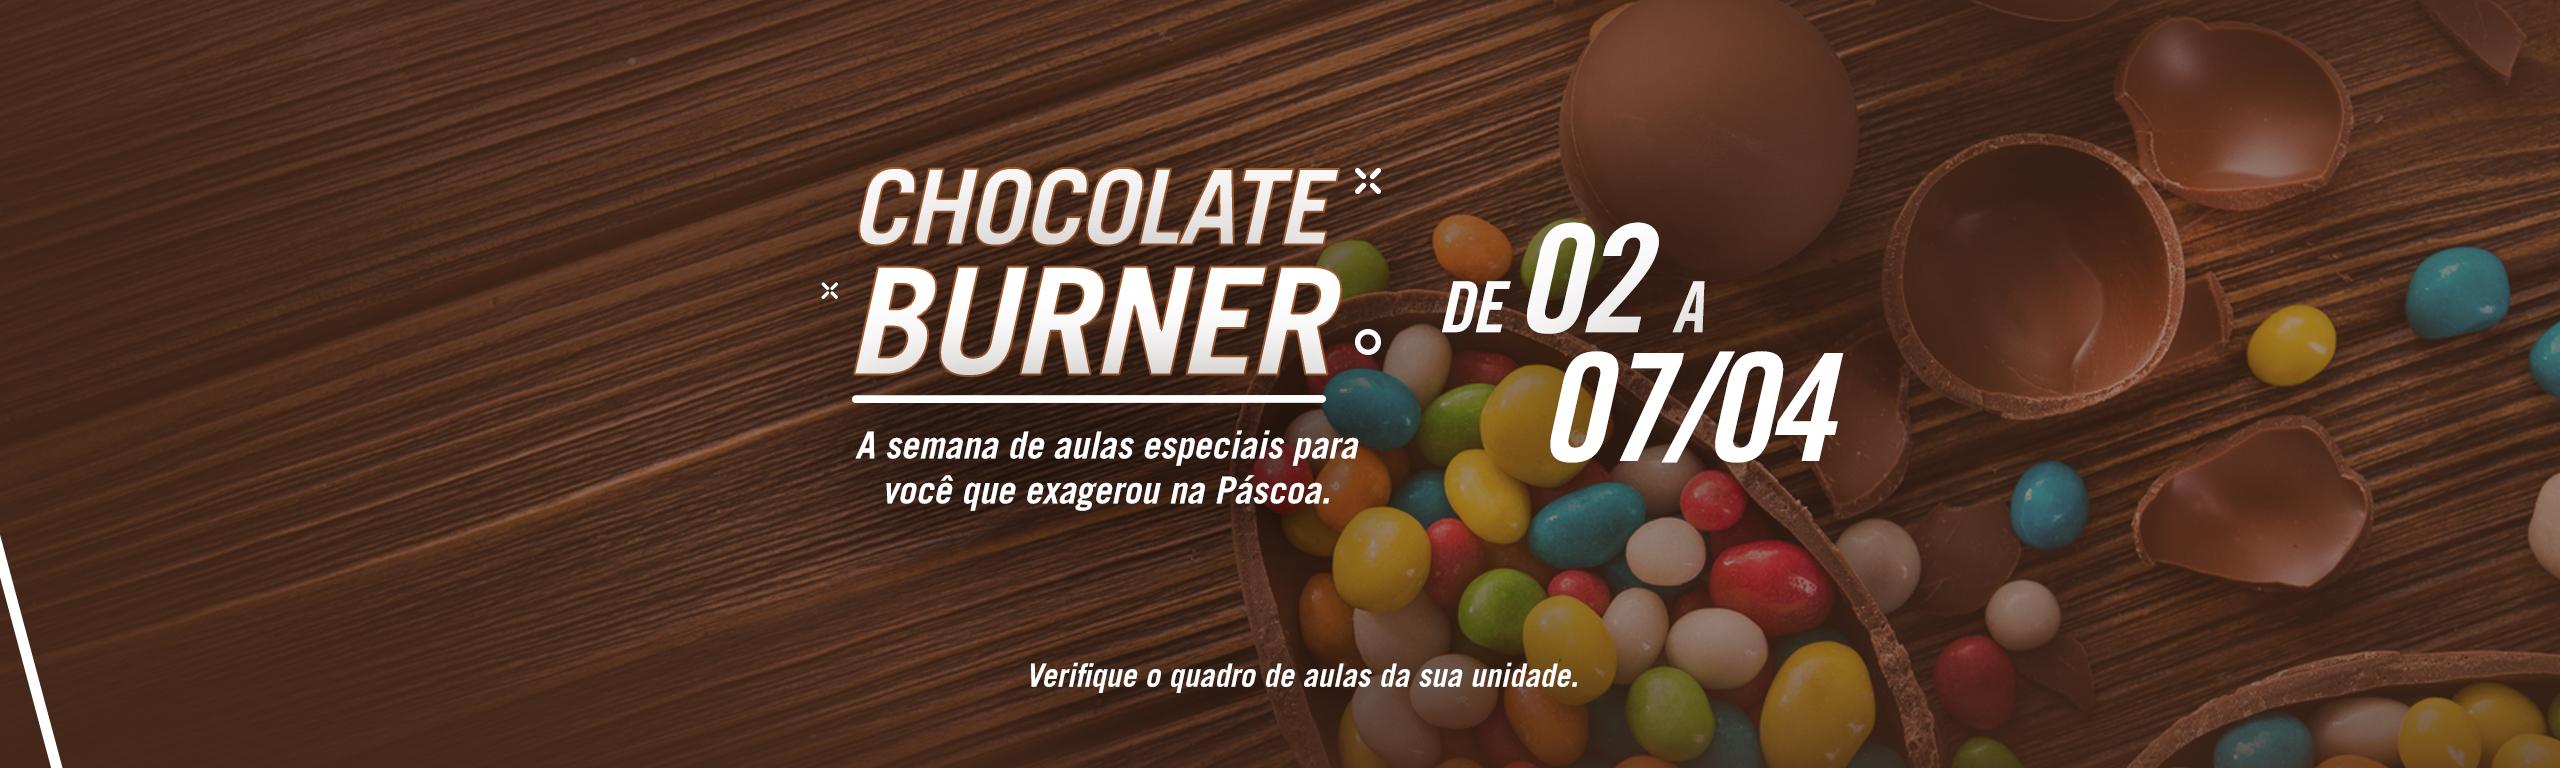 Banner_chocolate_burner2